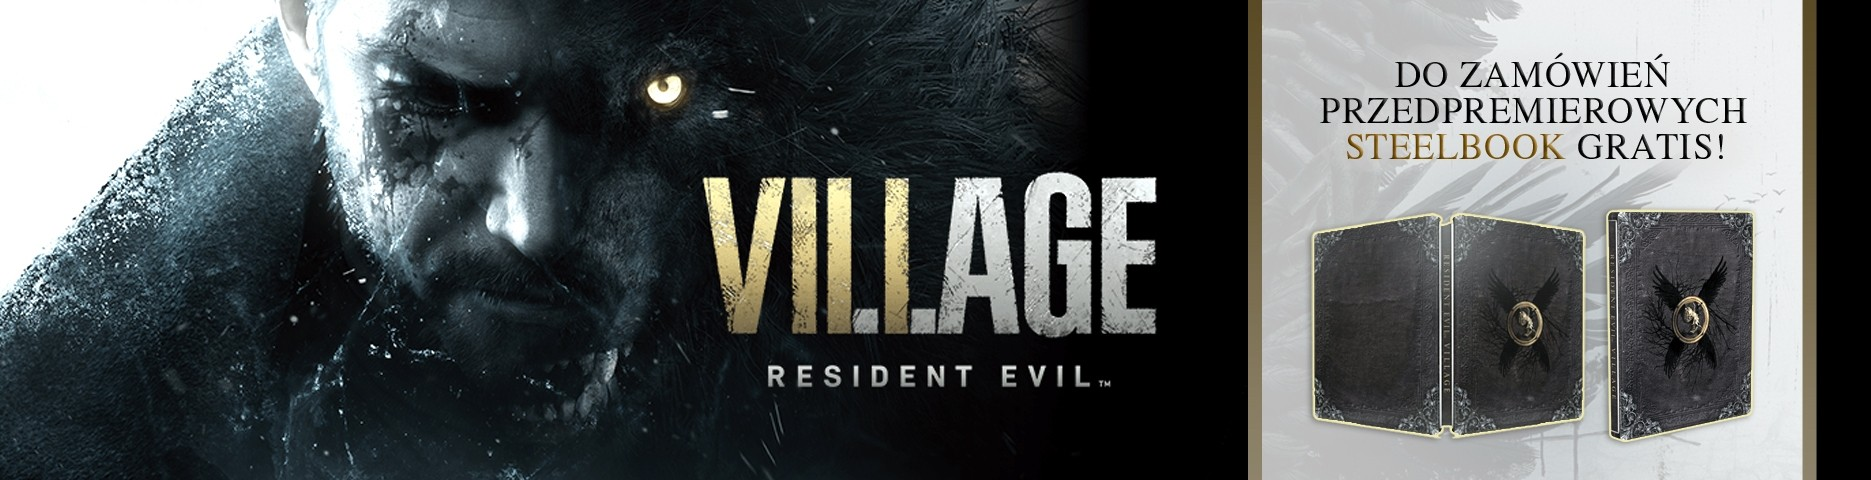 Resident Evil Village: Steelbook gratis!